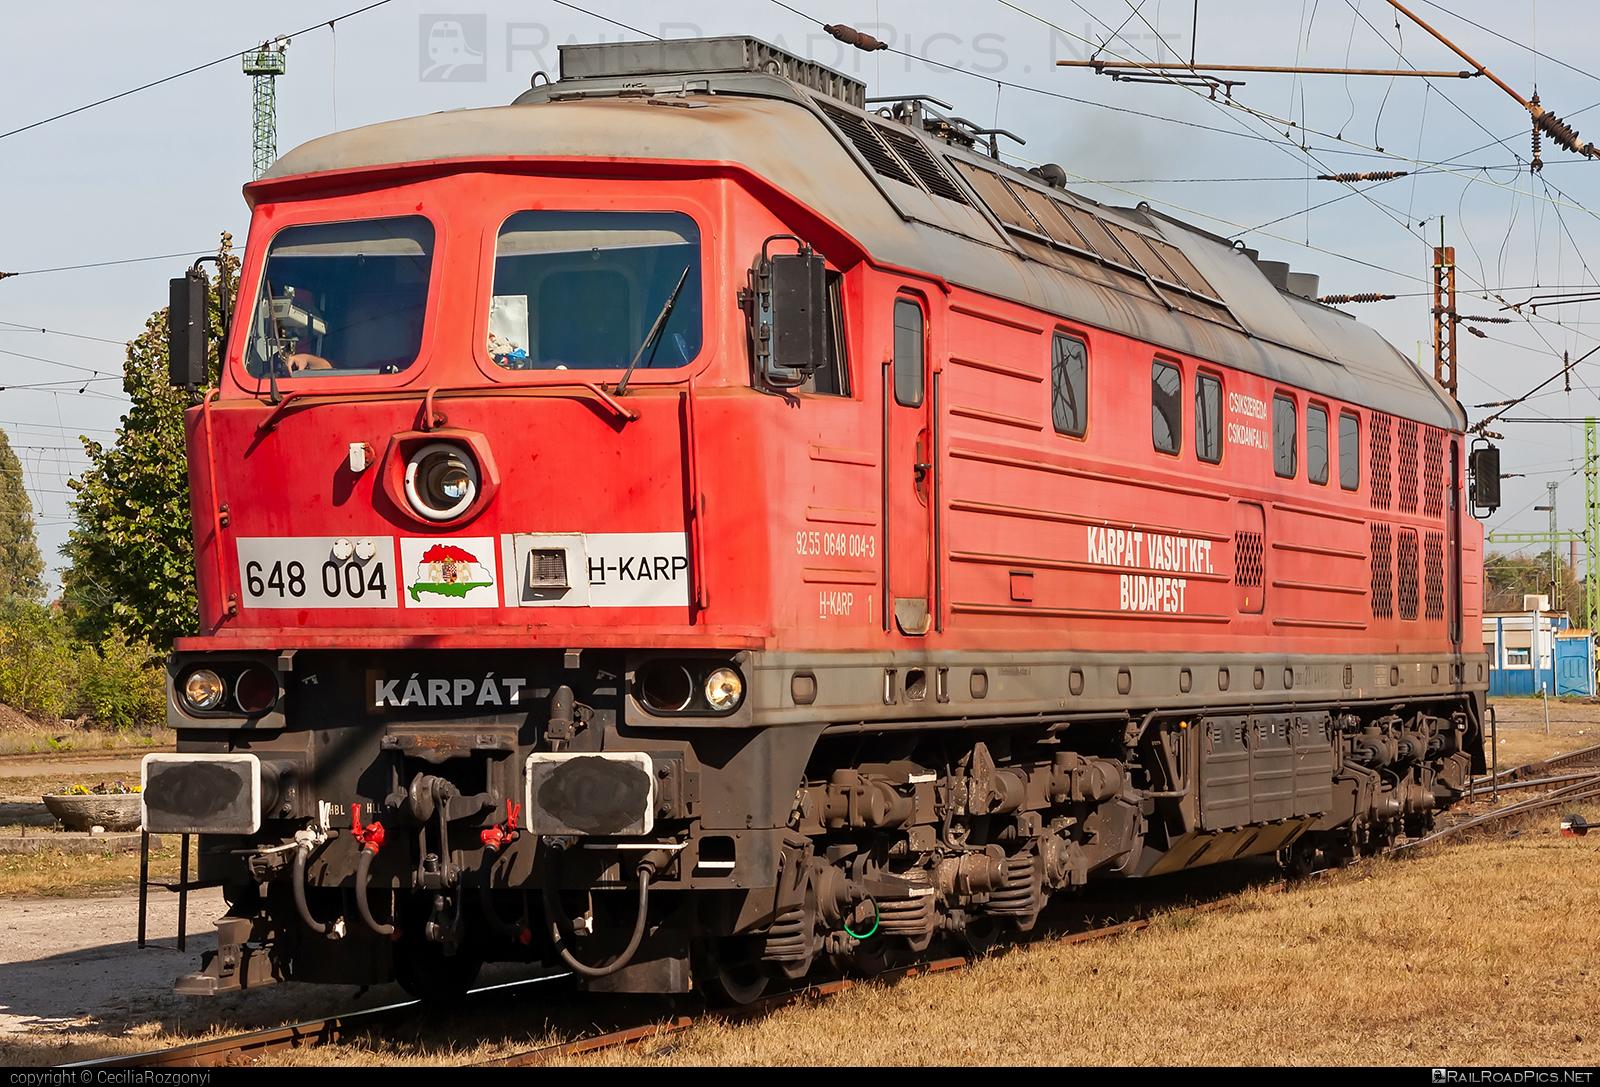 Lugansk TE109 - 648 004 operated by KÁRPÁT Vasút Kft #db233 #ltz #ltzte109 #ludmila #ludmilla #lugansk #luganskte109 #luganskteplovoz #luhansklocomotiveworks #luhanskteplovoz #ragulin